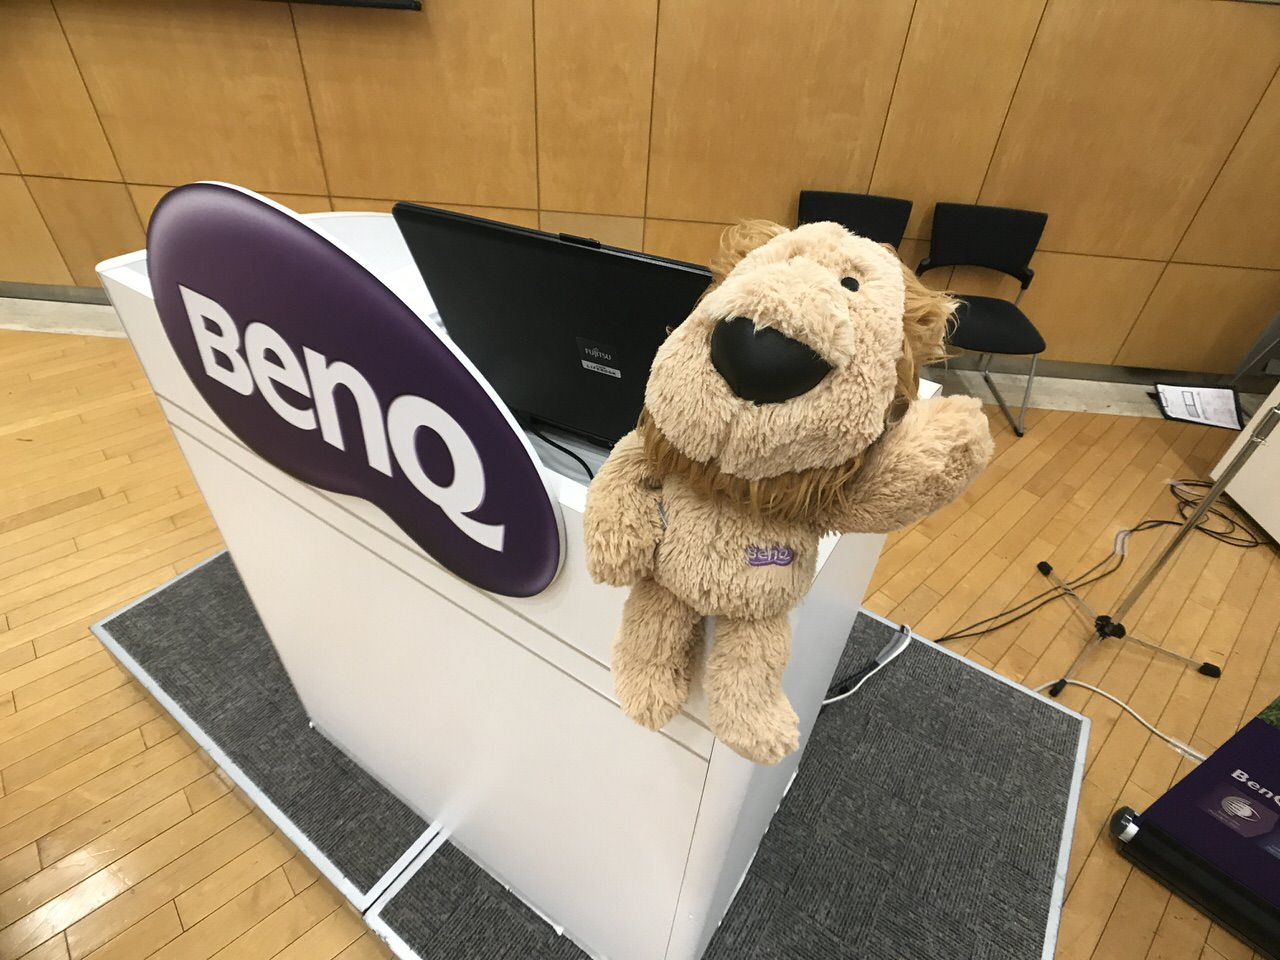 Benq monitor 8172